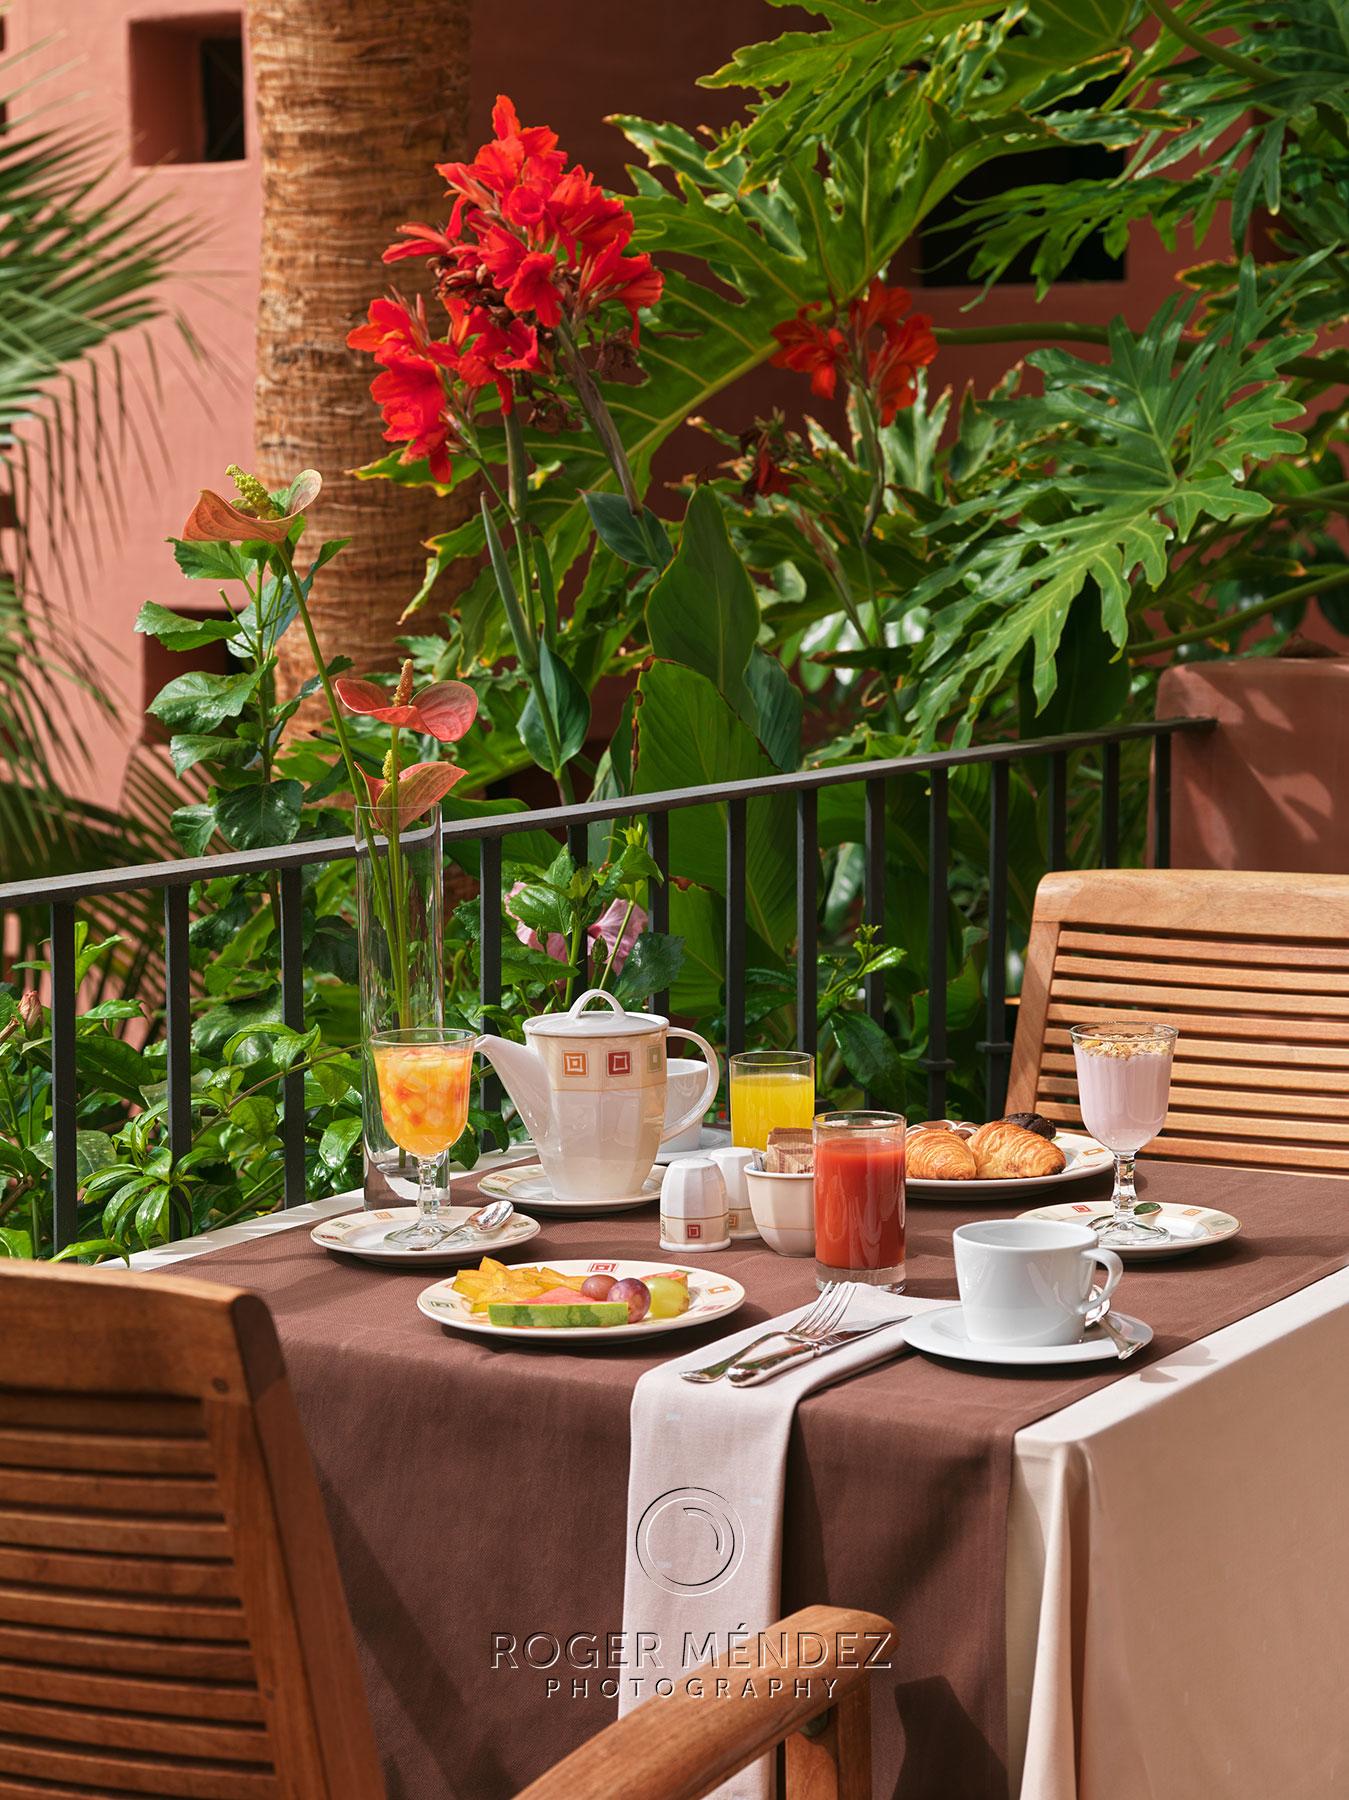 The Ritz-Carlton Abama Desayuno